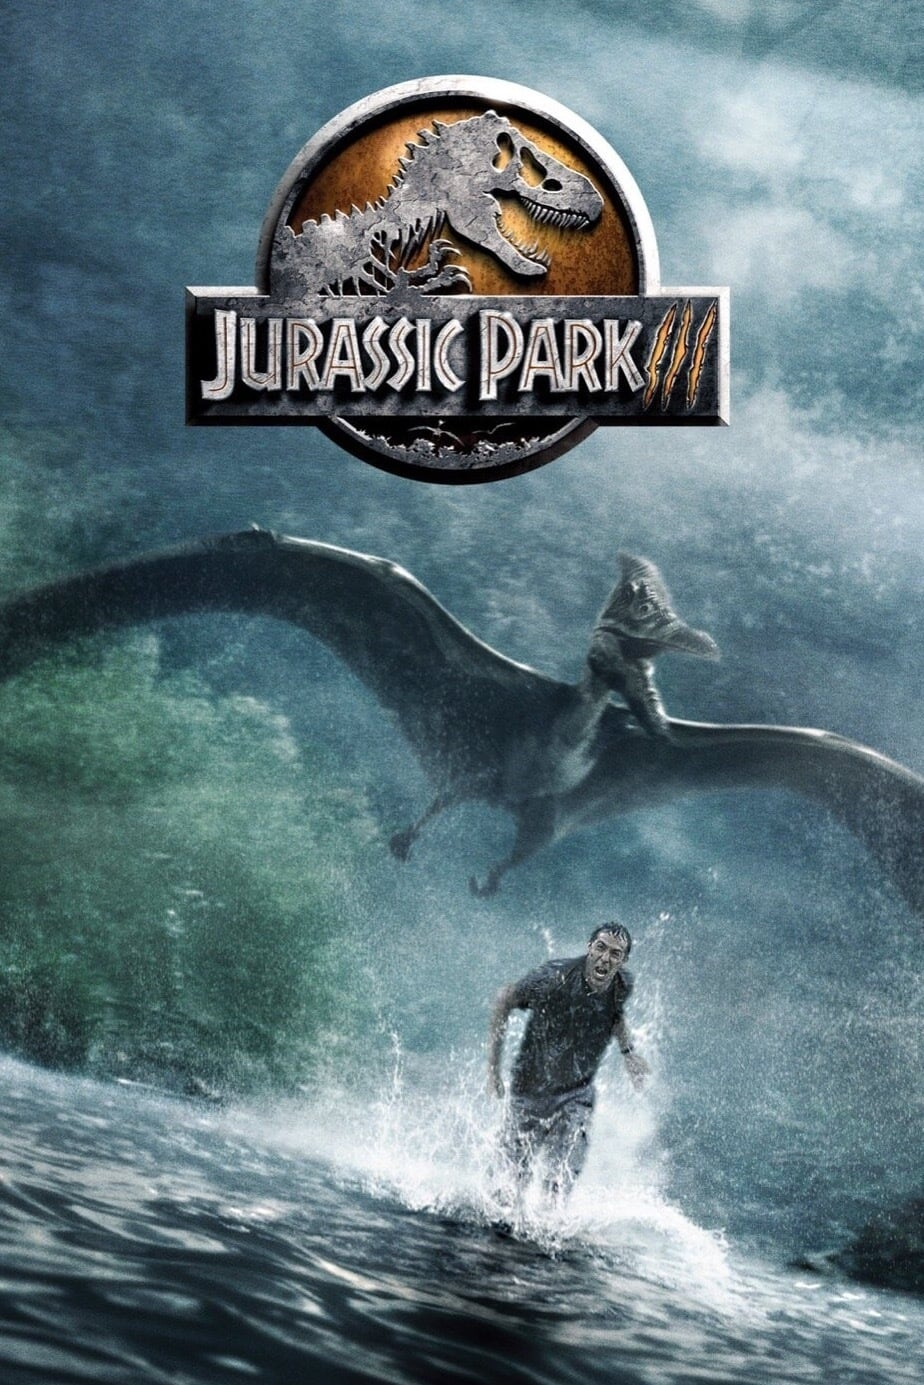 Jurassic Park III (2001) - Posters — The Movie Database (TMDb)